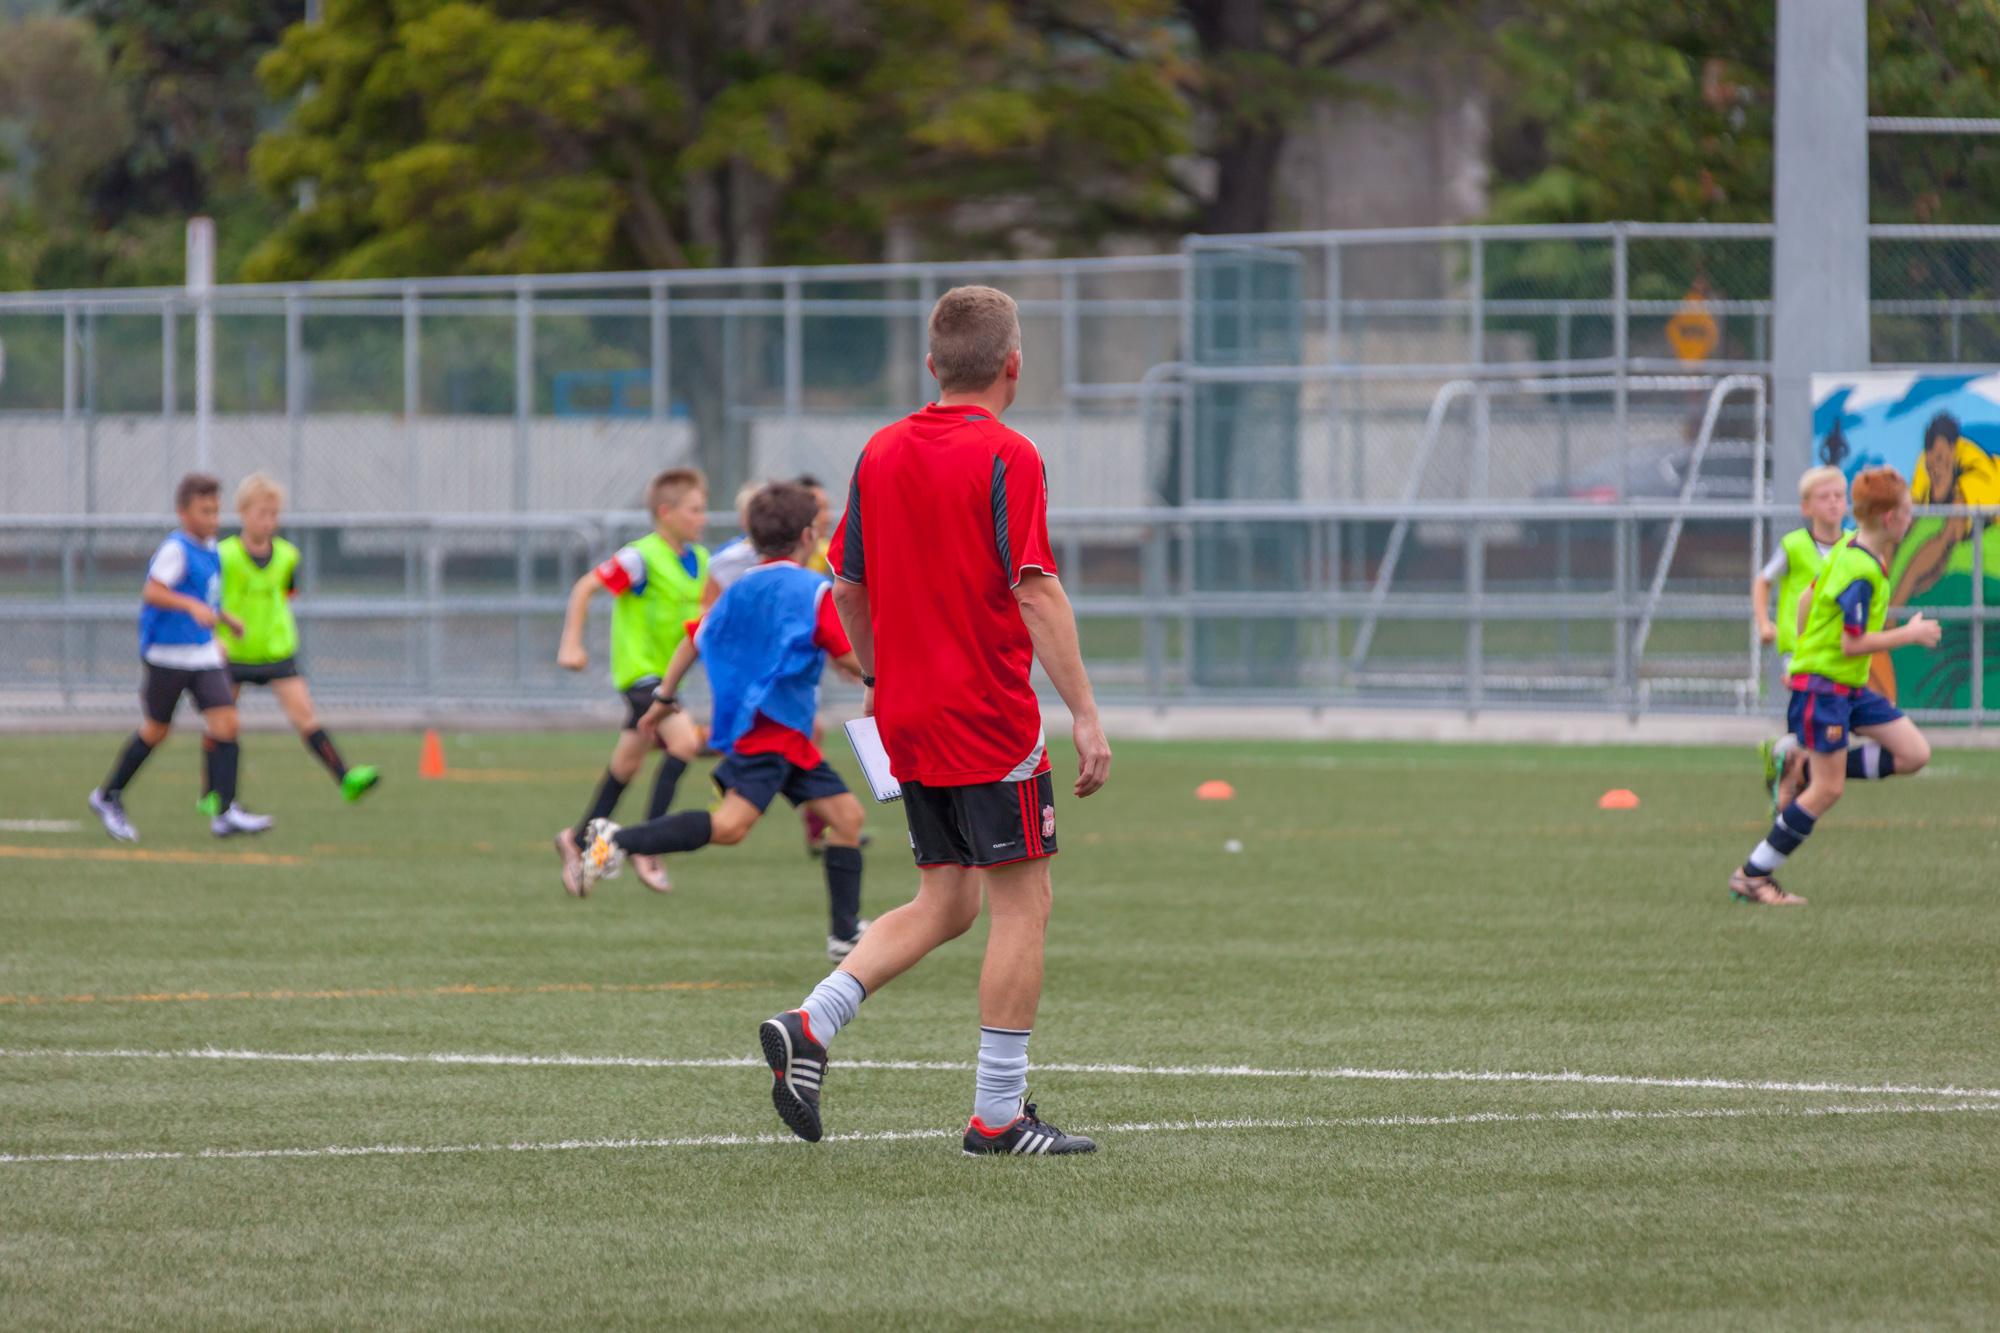 UHCC Soccer Coach 4417